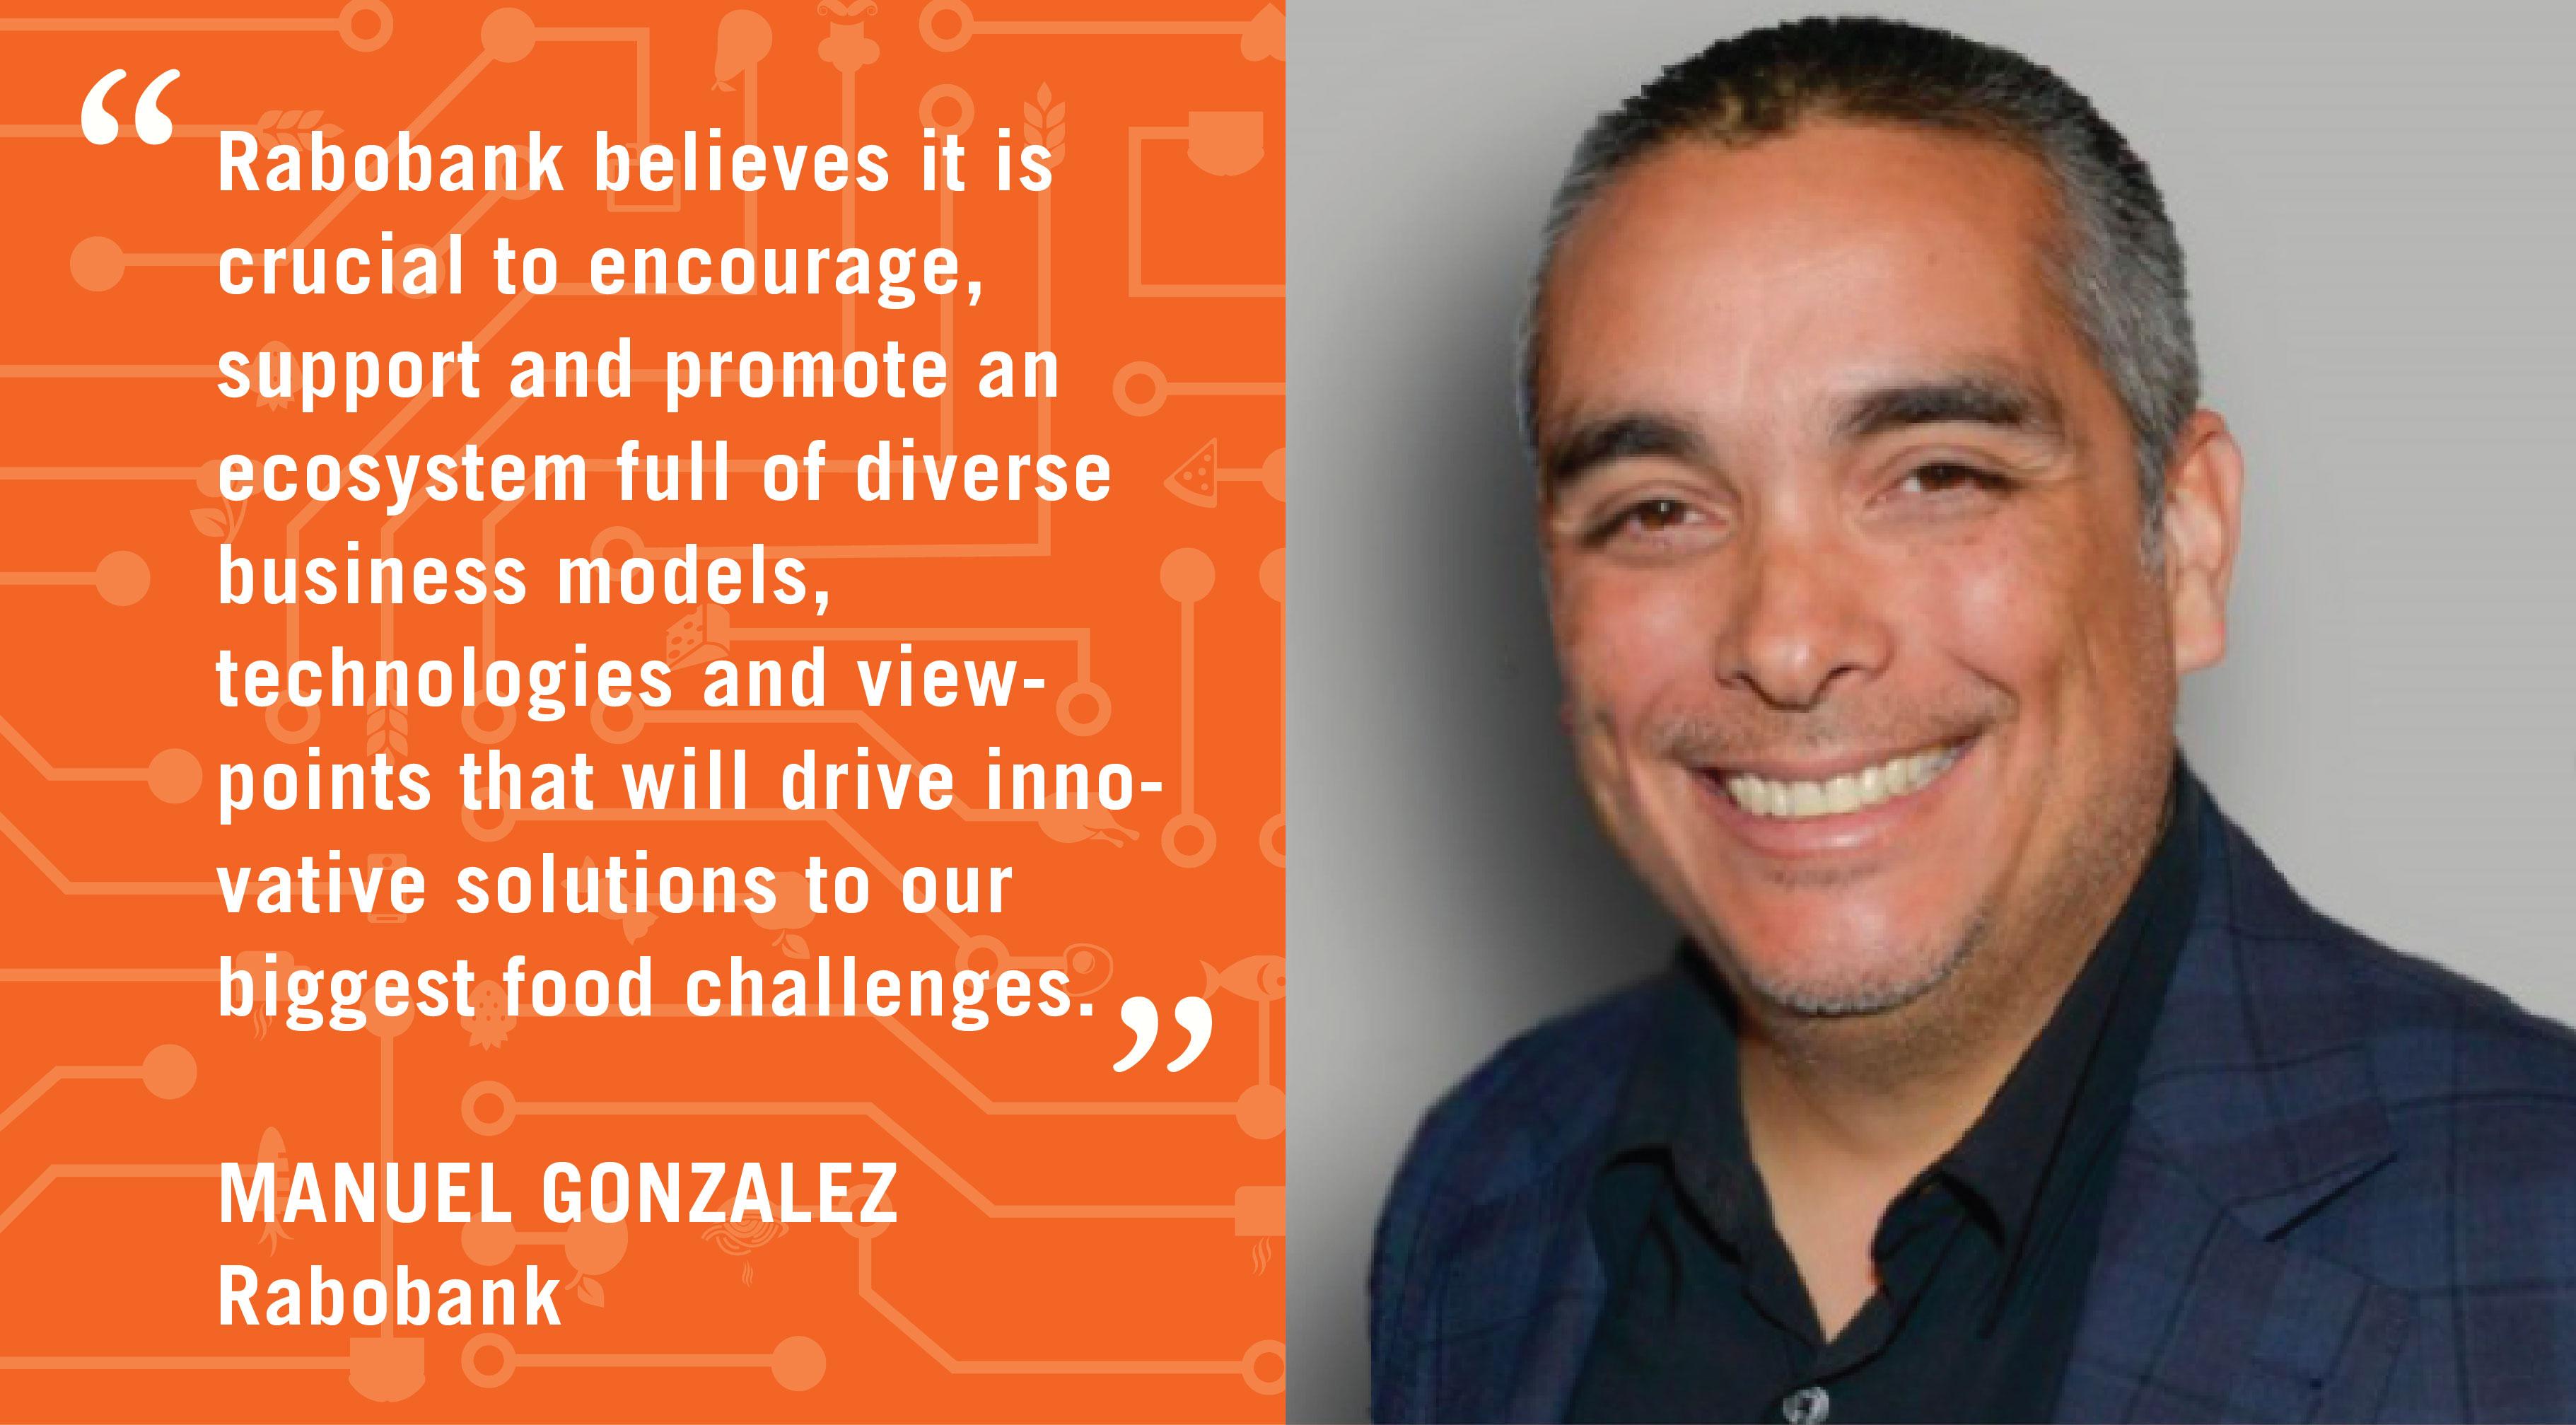 Manuel Gonzalez Supporting Food & Agriculture Entrepreneurs